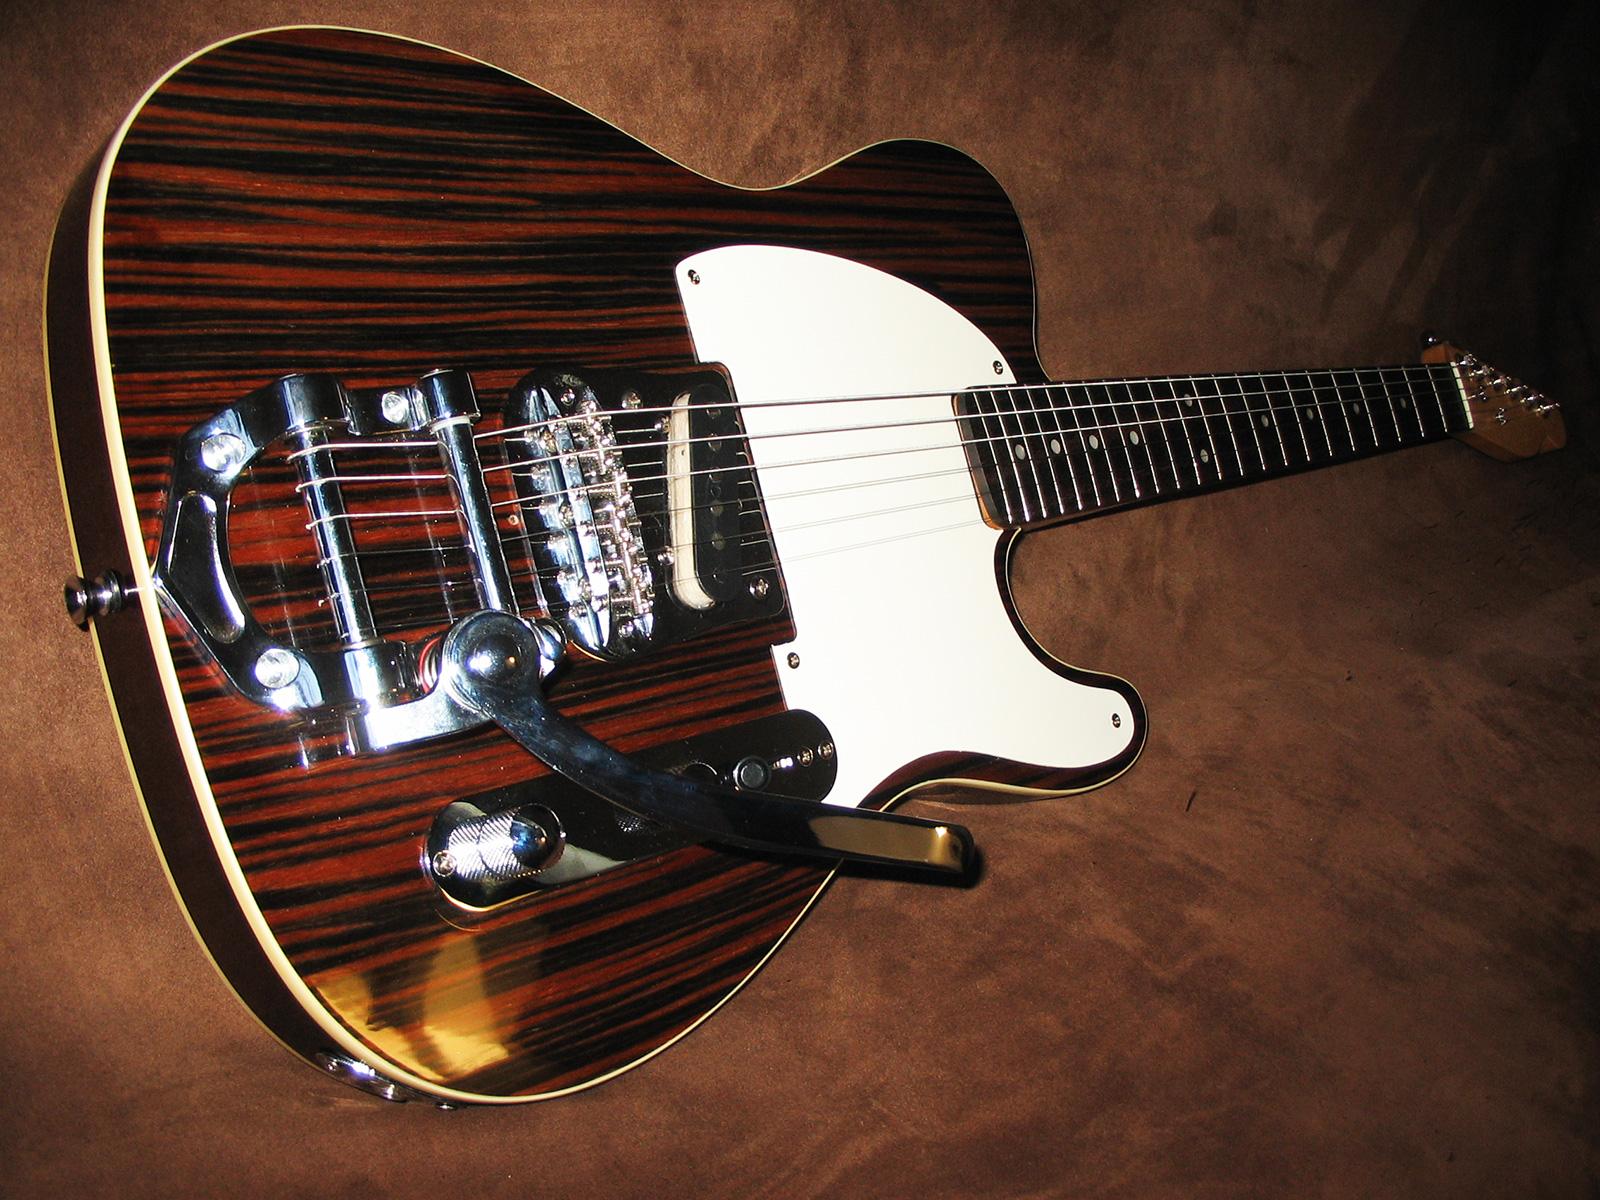 harley benton nul page 5 guitare lectrique. Black Bedroom Furniture Sets. Home Design Ideas